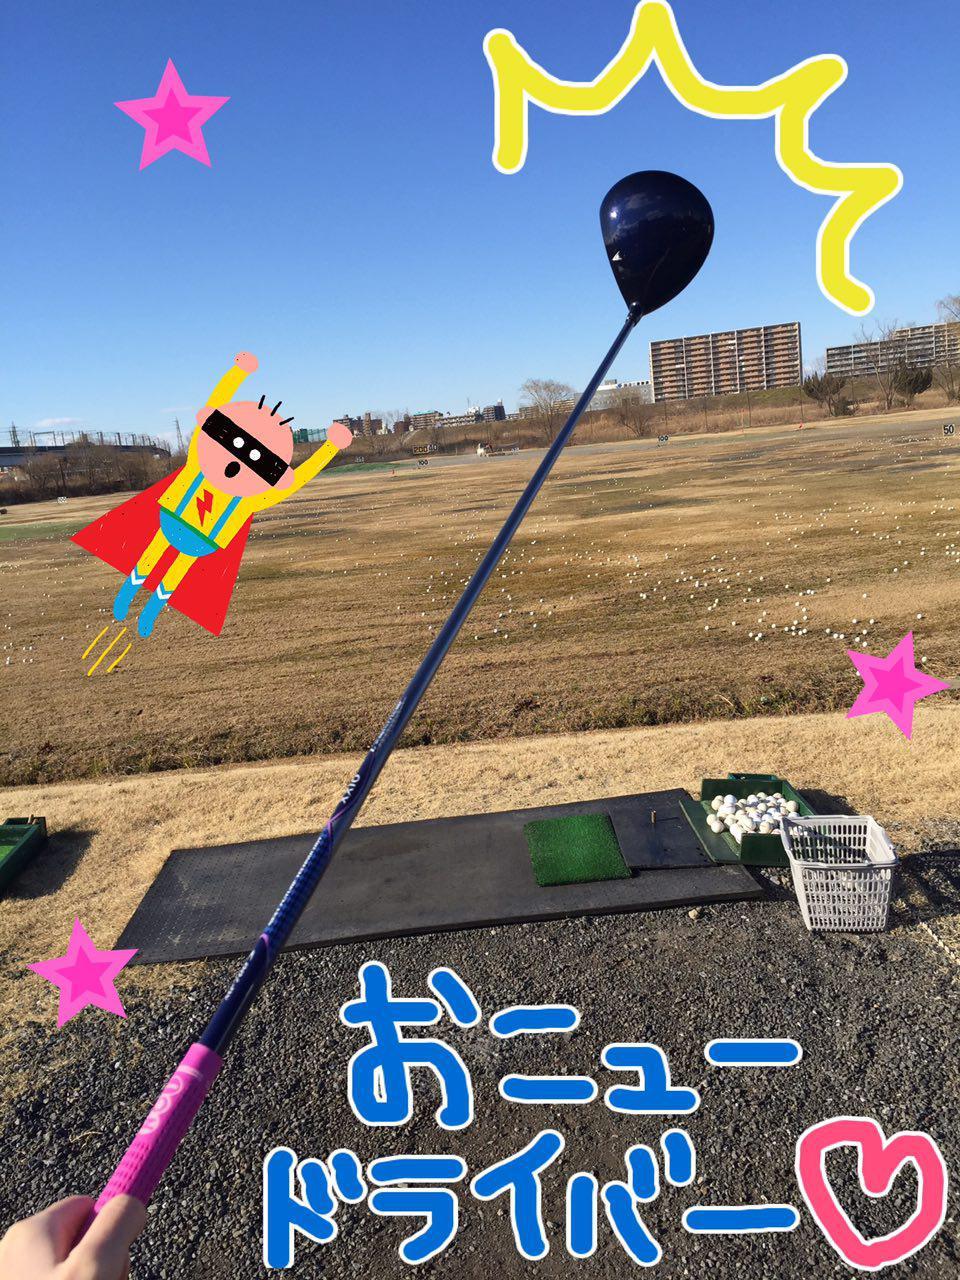 photo_2017-02-14_00-20-02.jpg